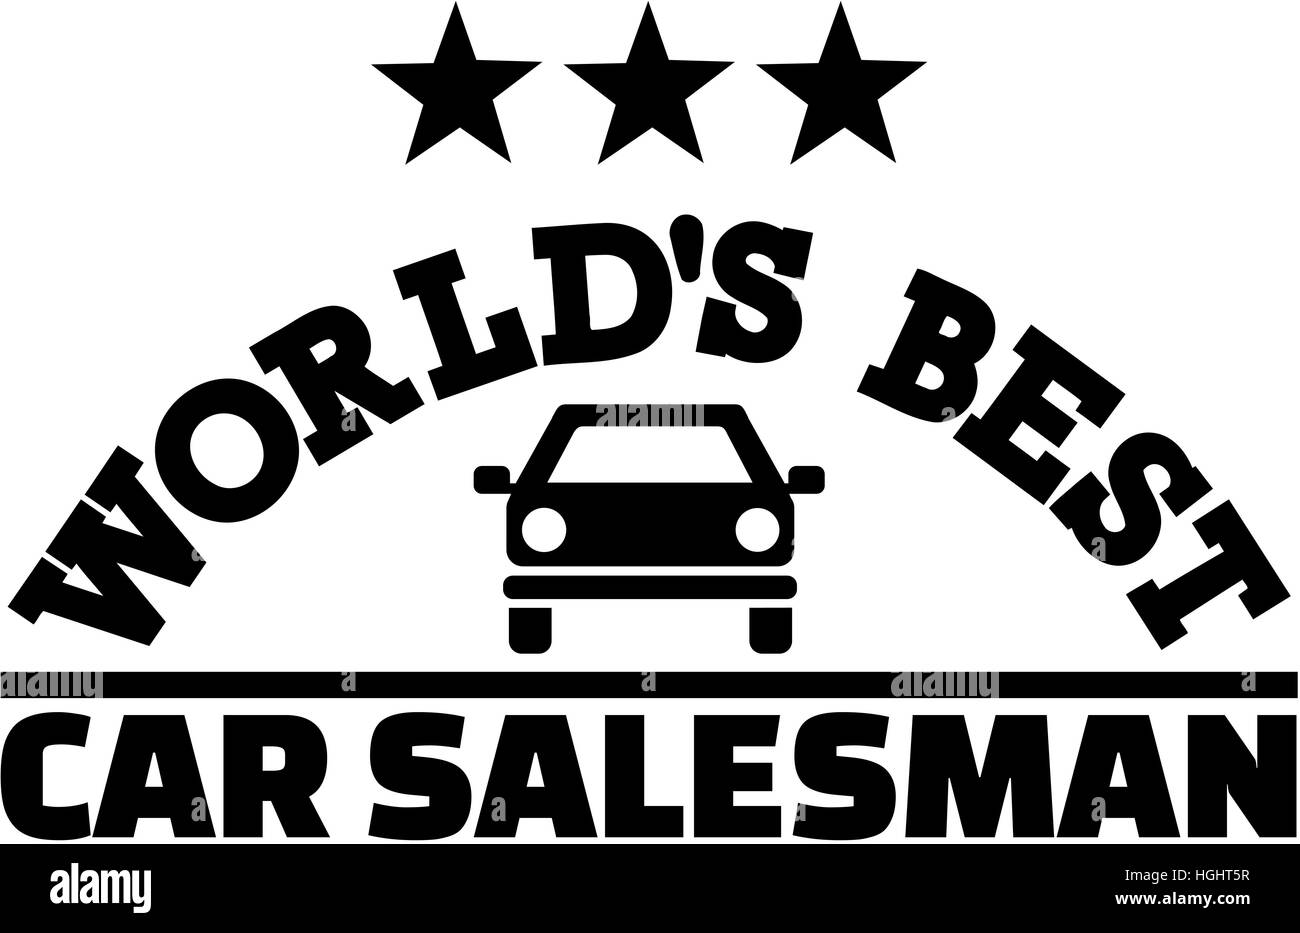 World S Best Car Salesman Stock Photo 130699235 Alamy